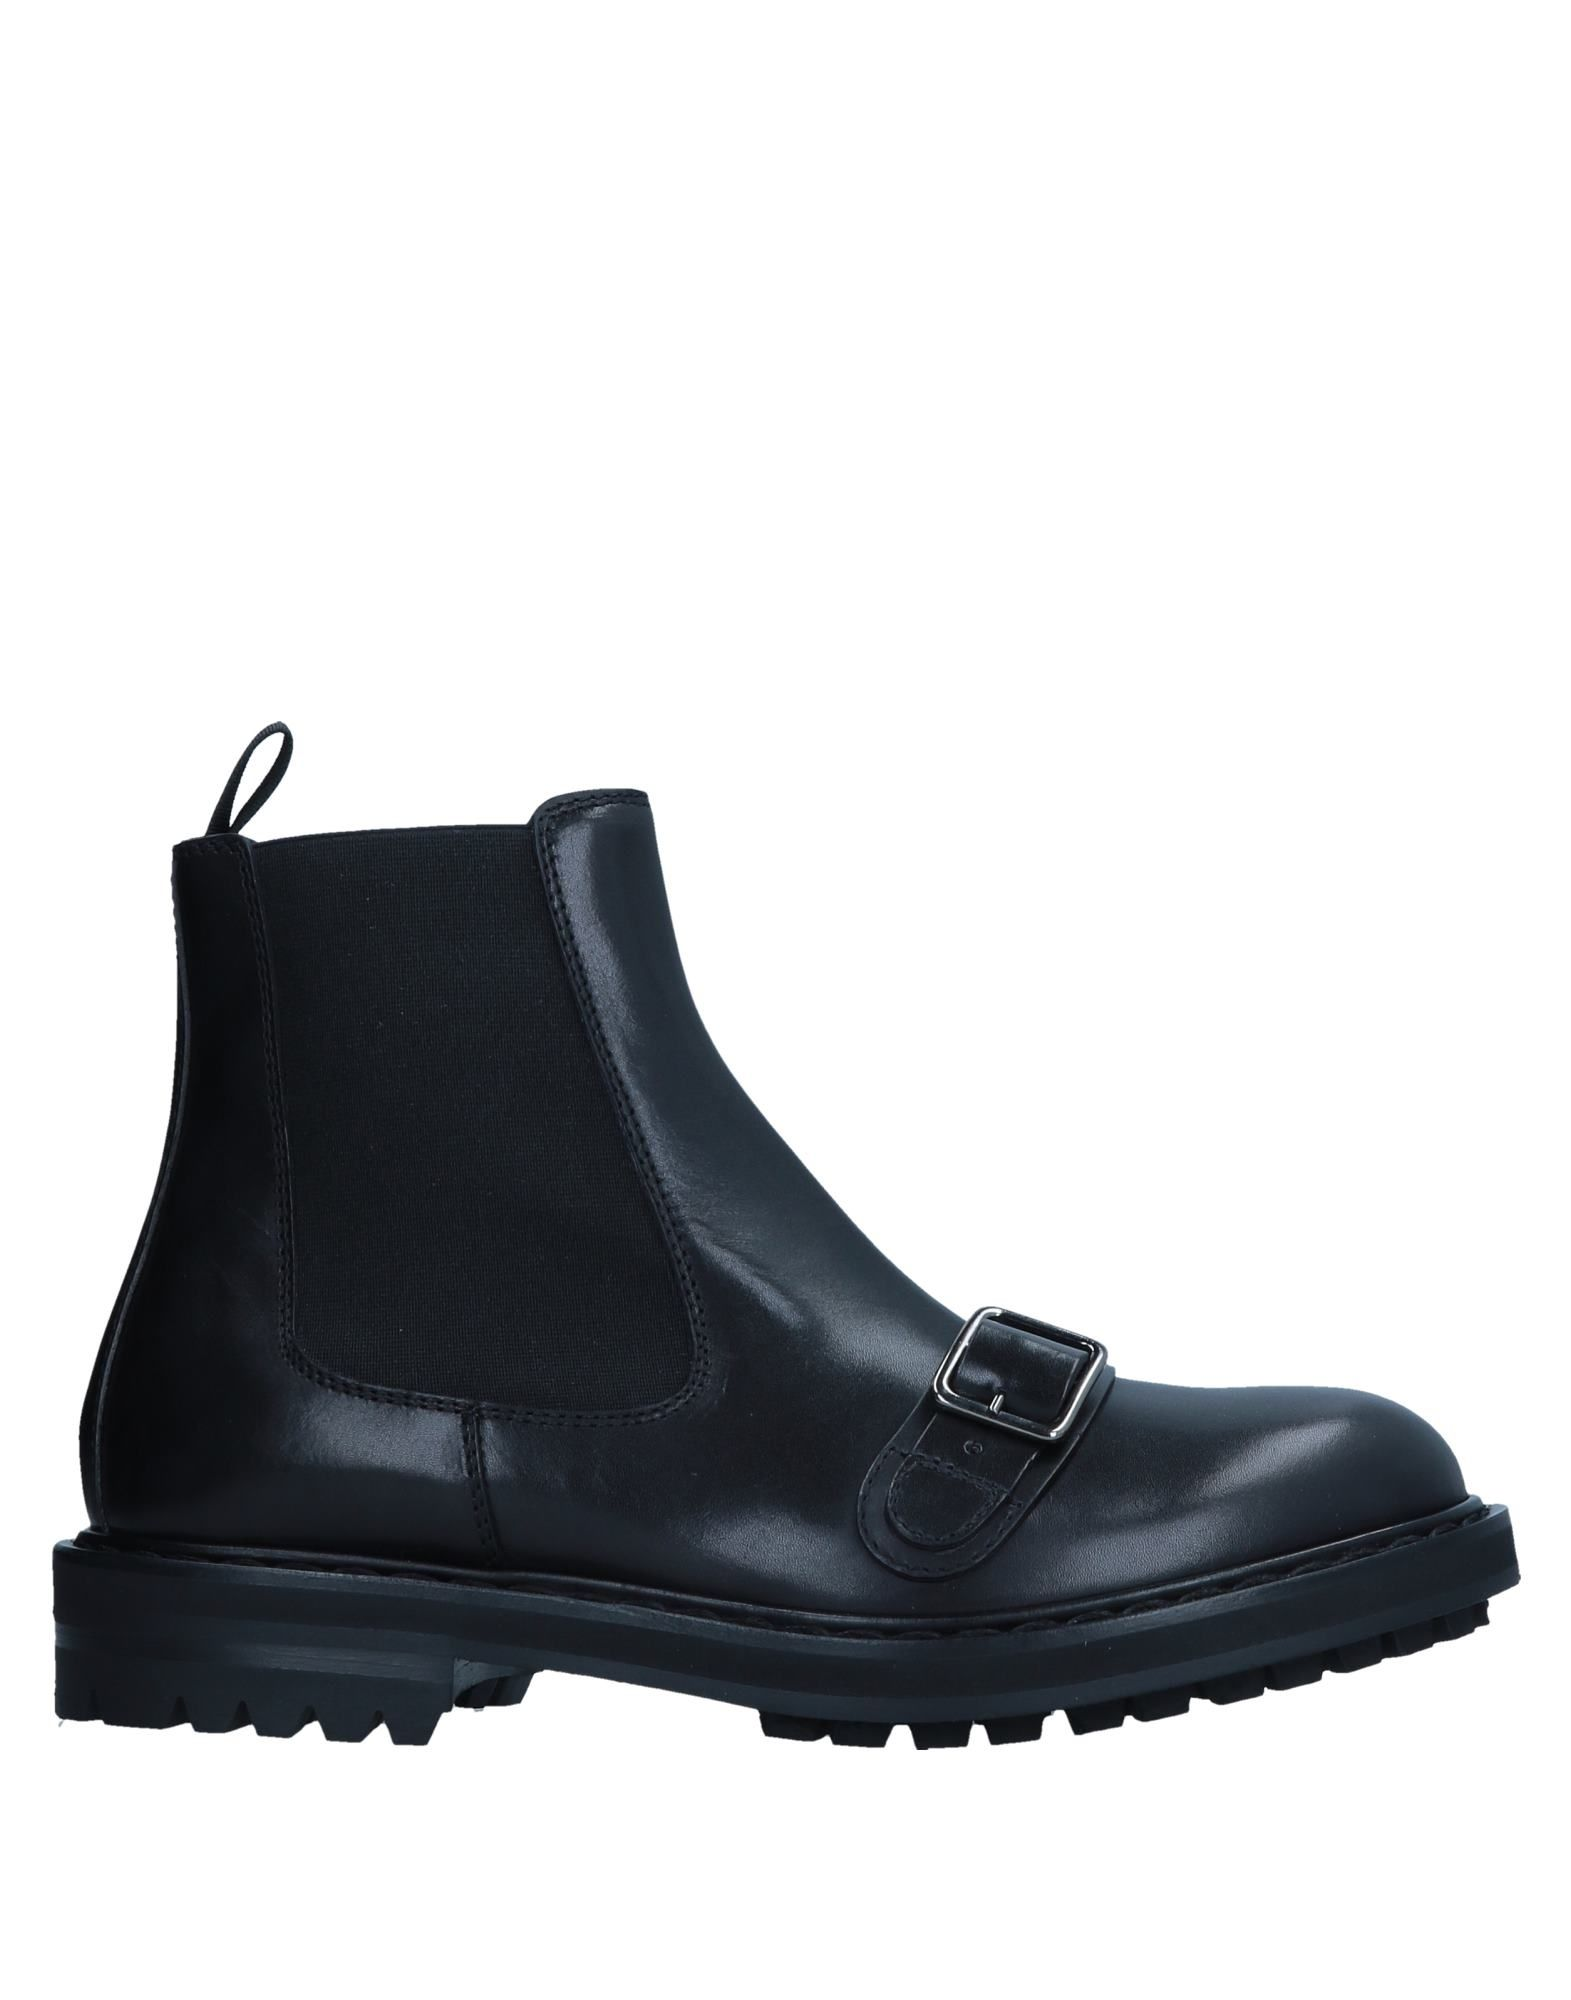 Alexander Mcqueen Stiefelette Herren  11552673JN Gute Qualität beliebte Schuhe